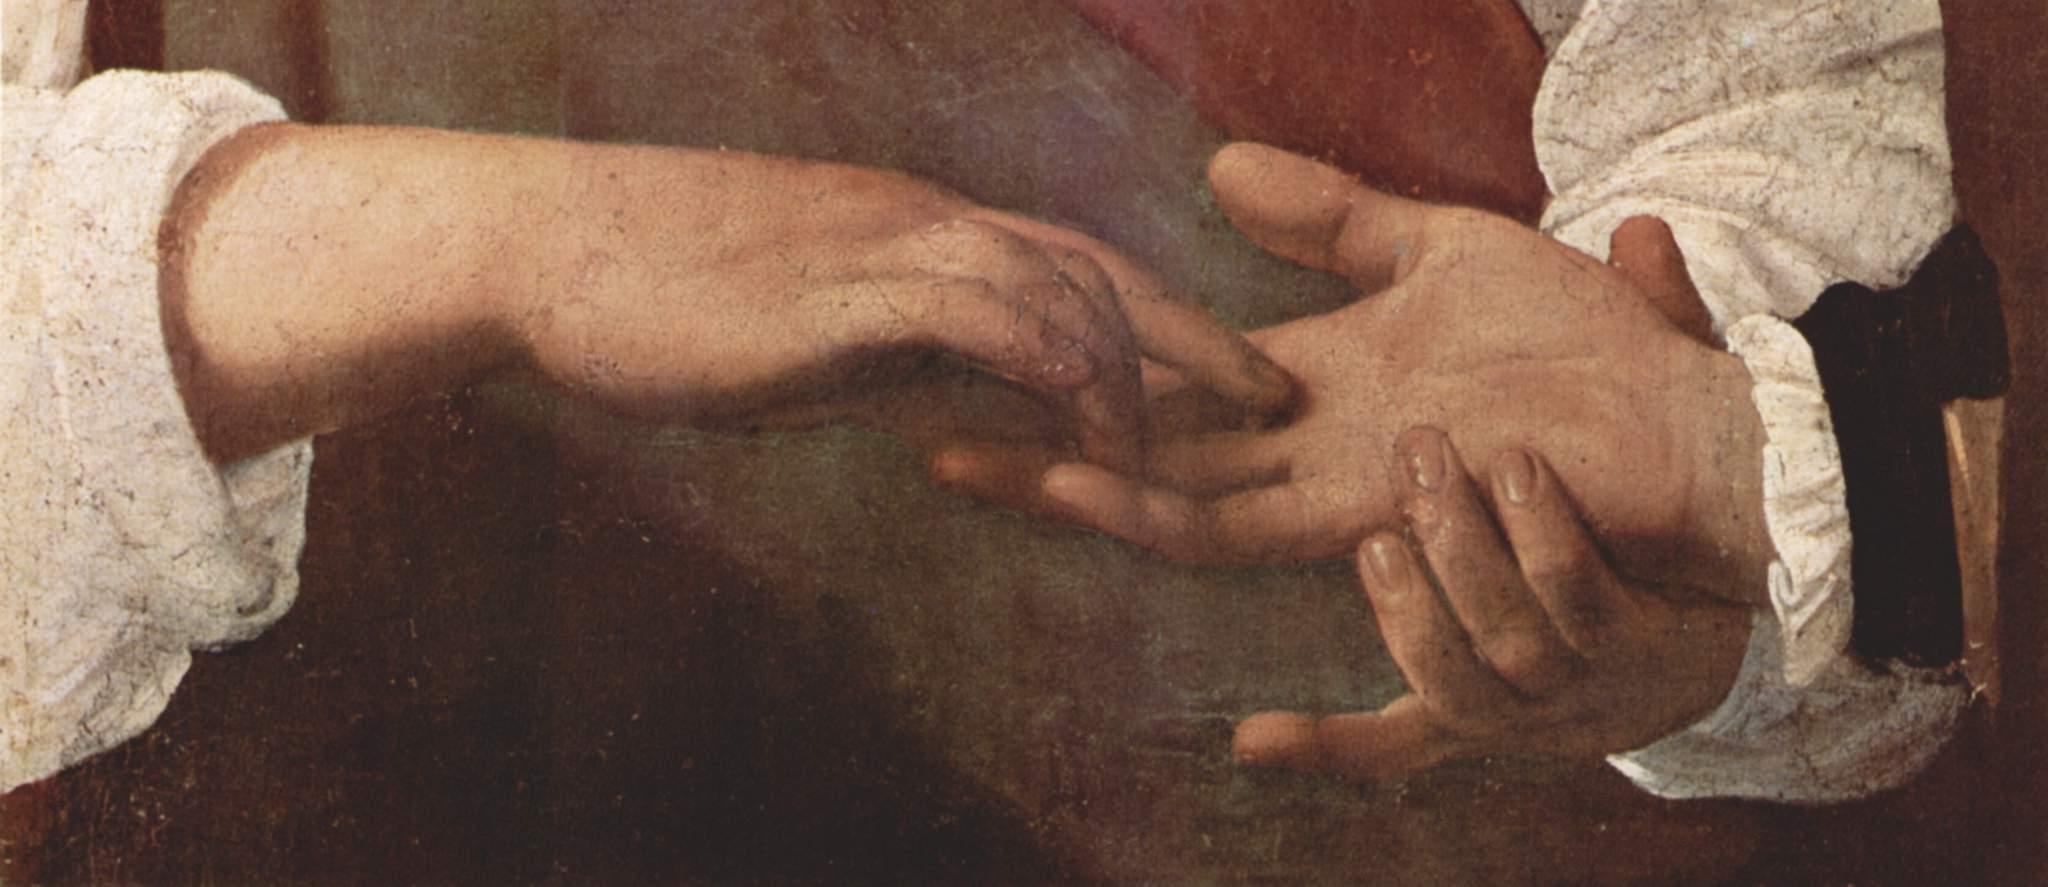 Гадалка. Деталь  руки (кража кольца), Микеланджело Меризи де Караваджо